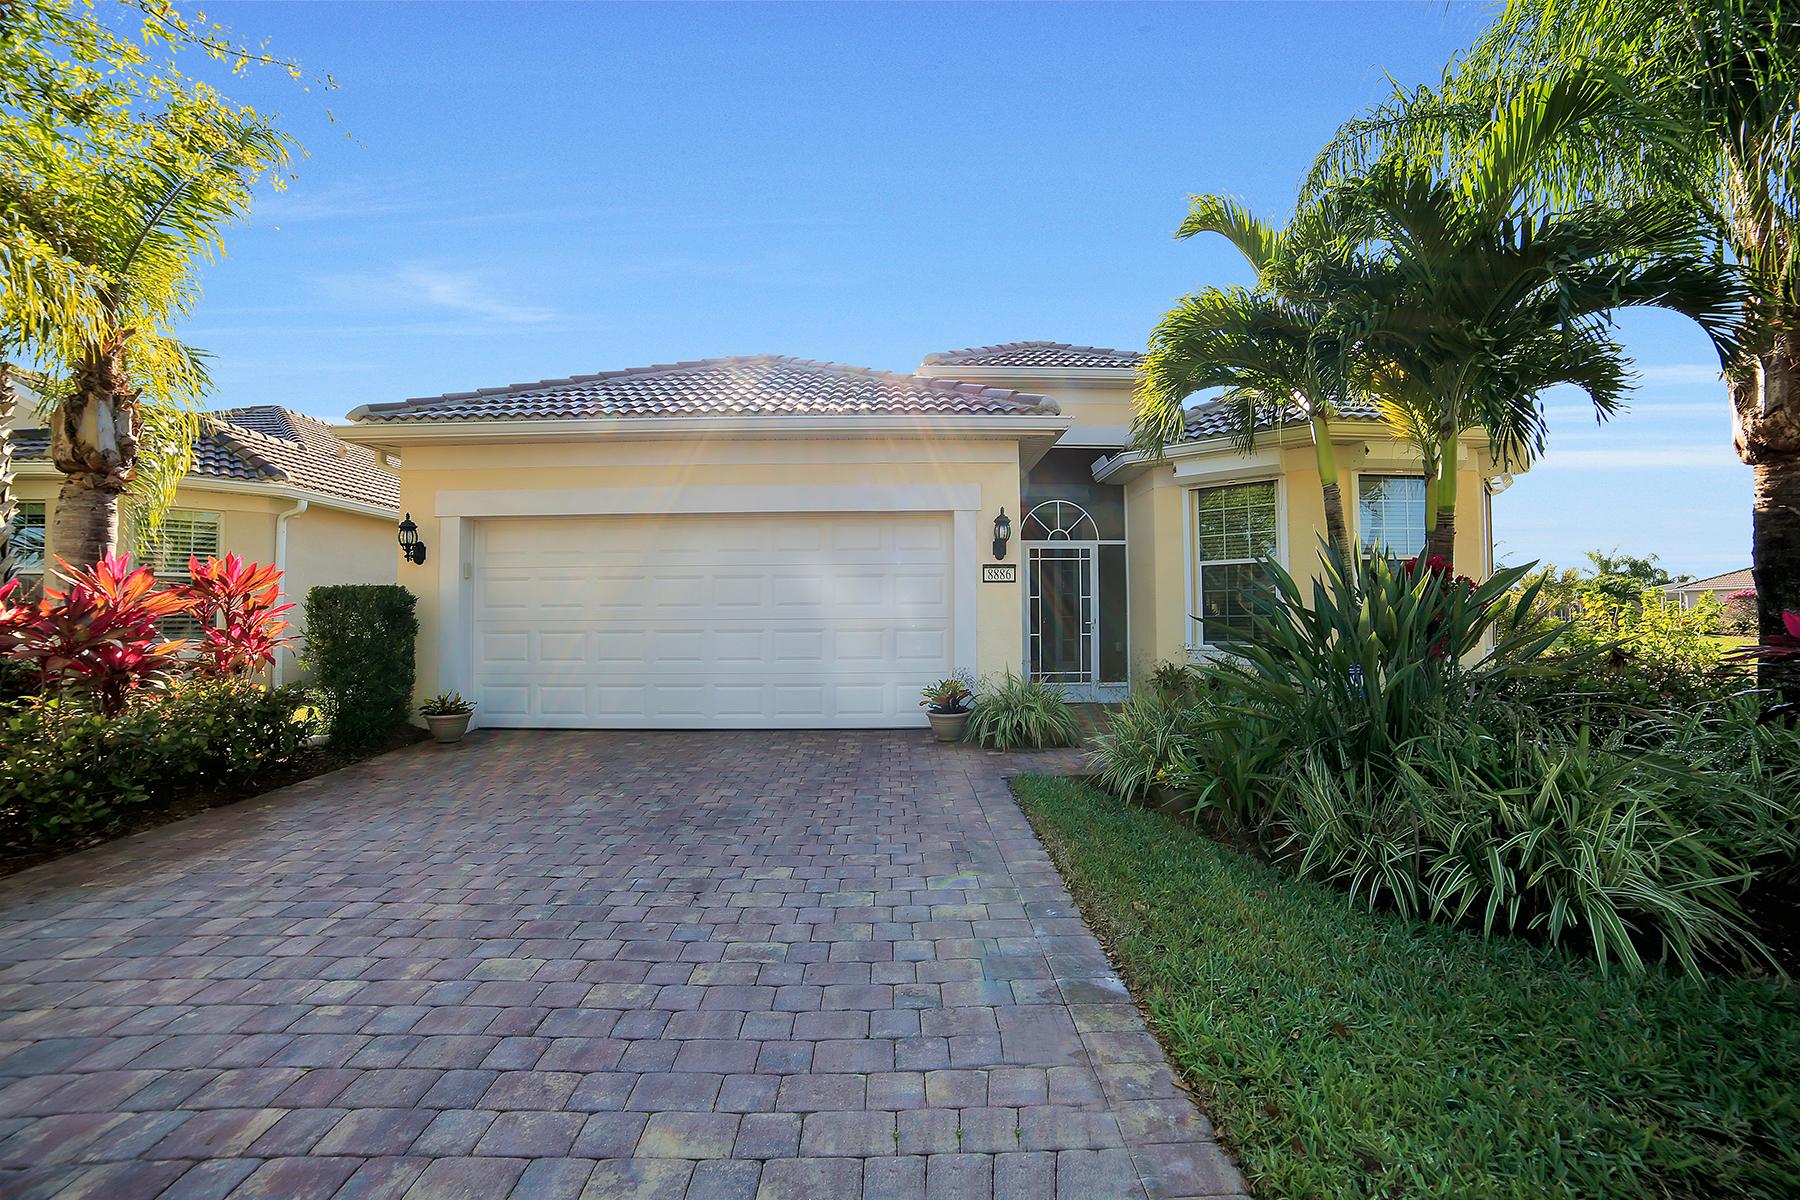 Single Family Home for Sale at VERONA WALK 8886 Ravello Ct, Naples, Florida 34114 United States